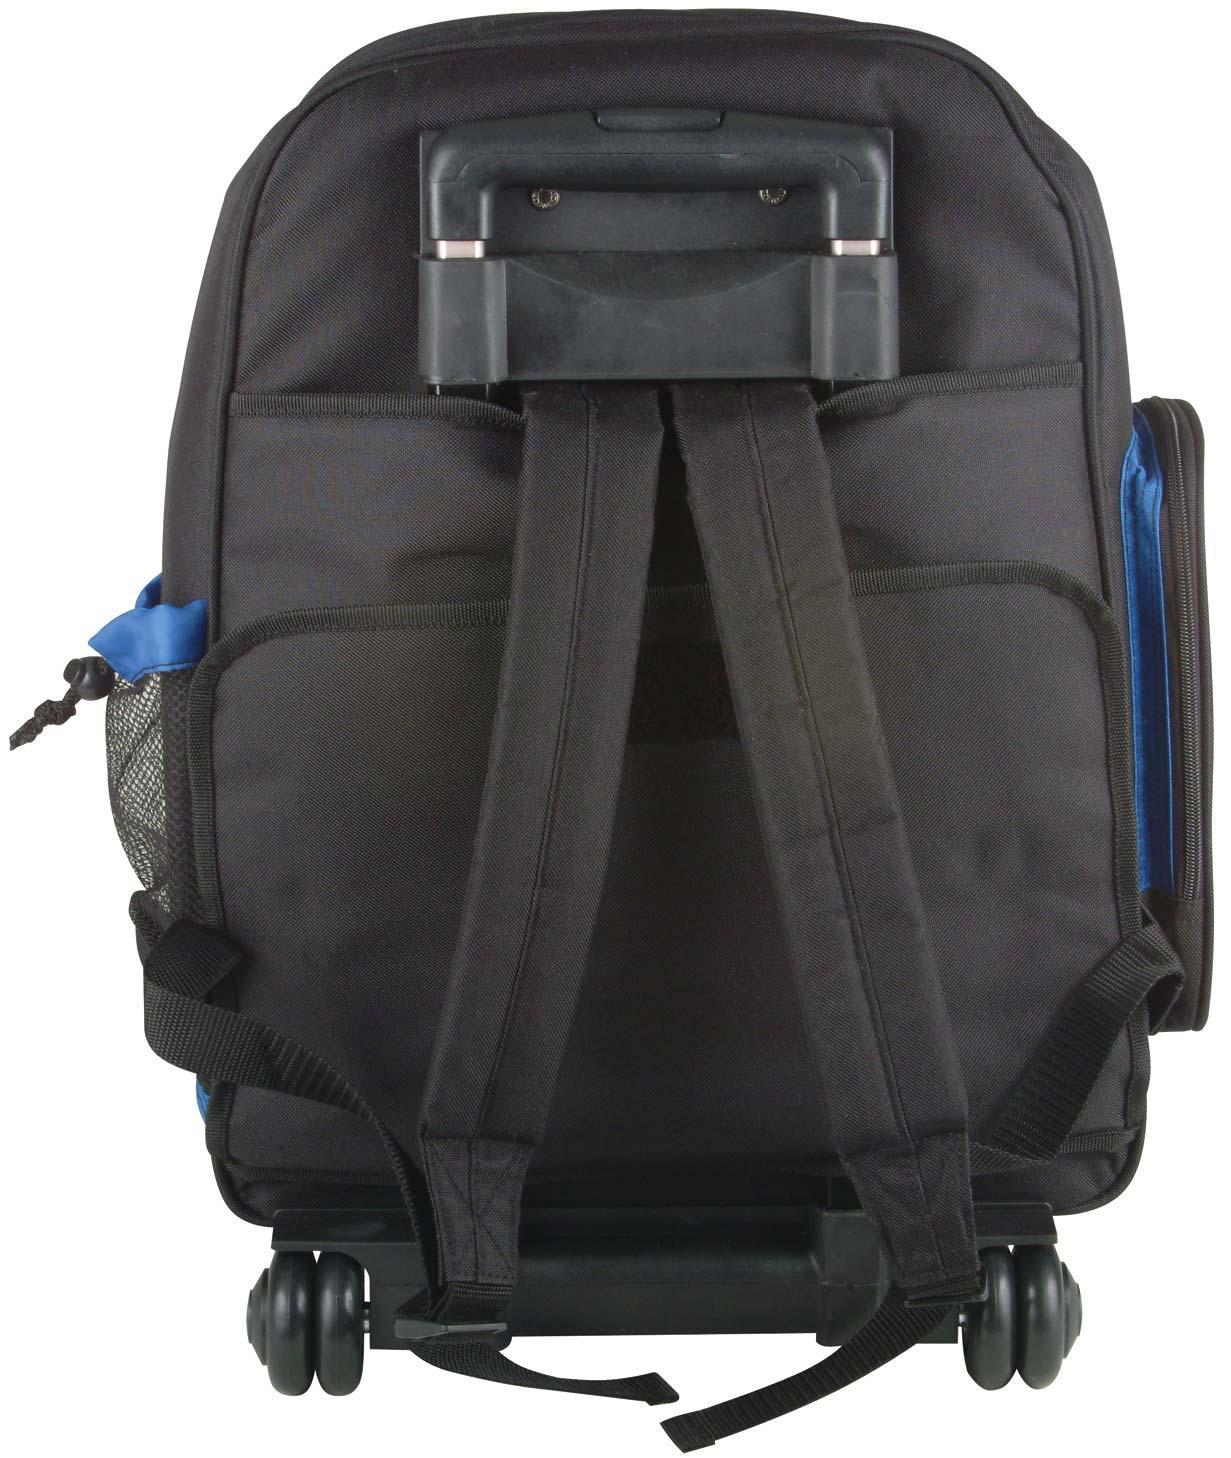 arriba ls520 wheeled backpack dj lighting transport case